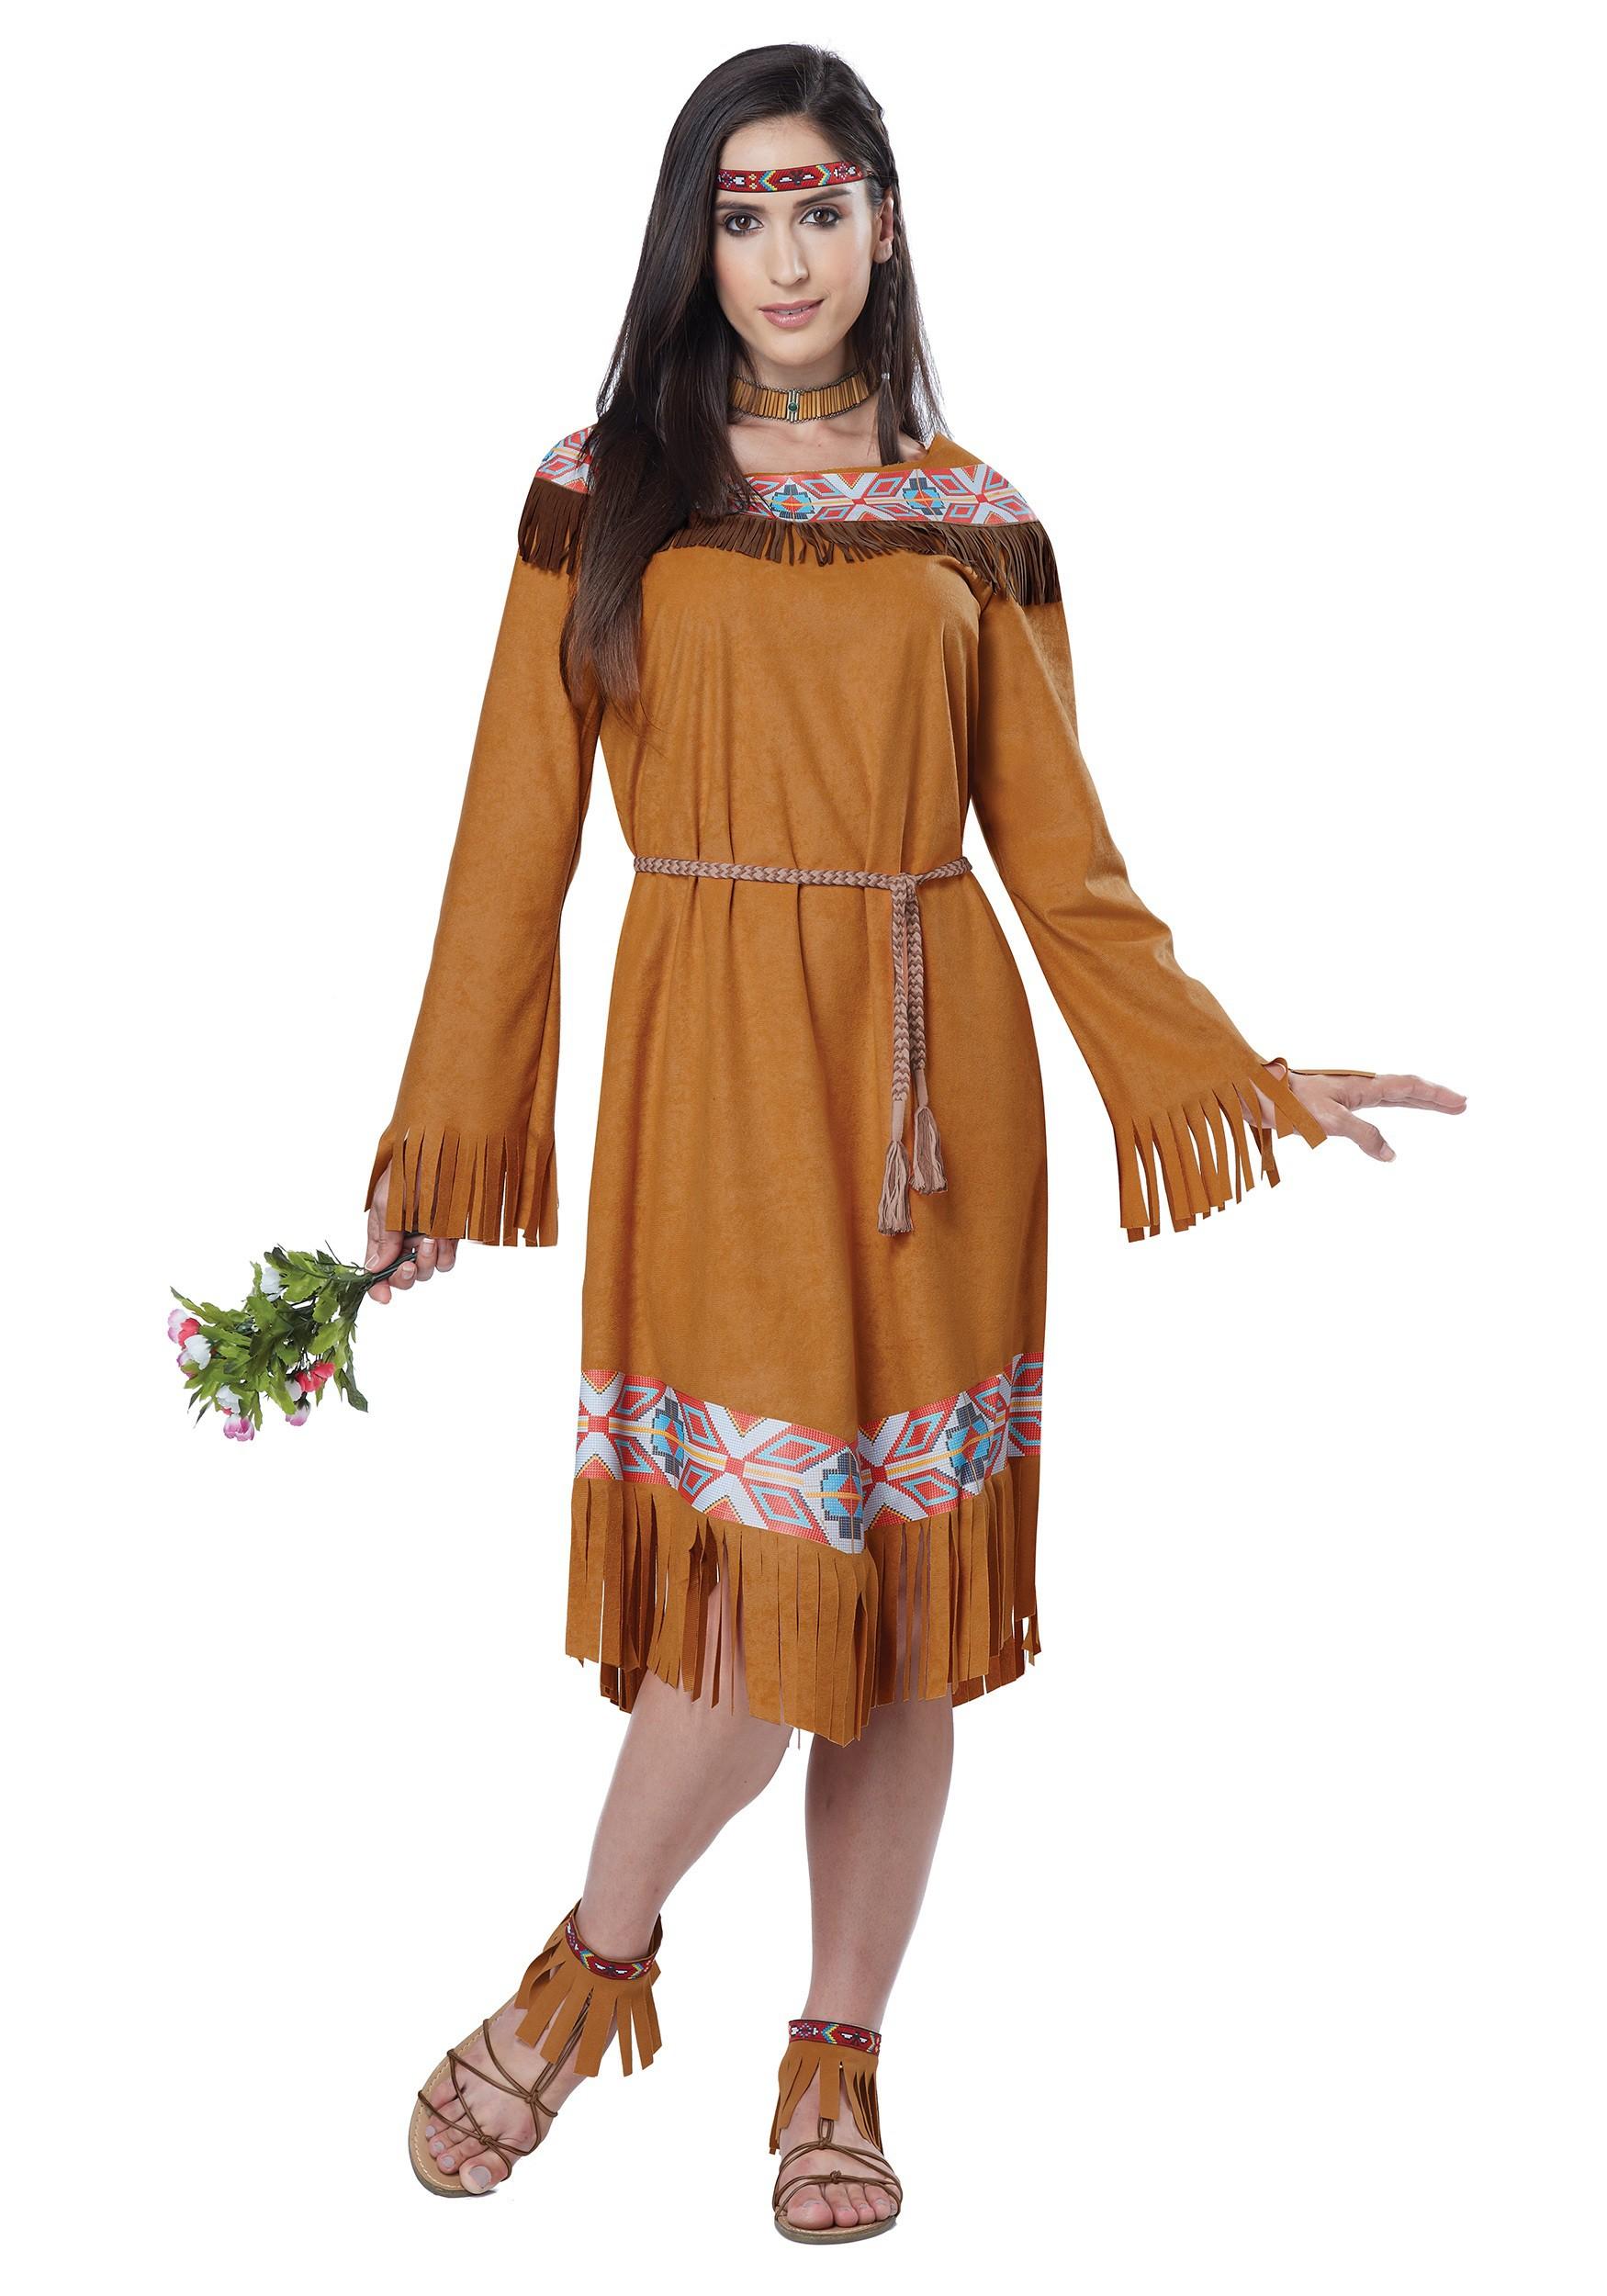 Classic Native American Maiden Costume for Women